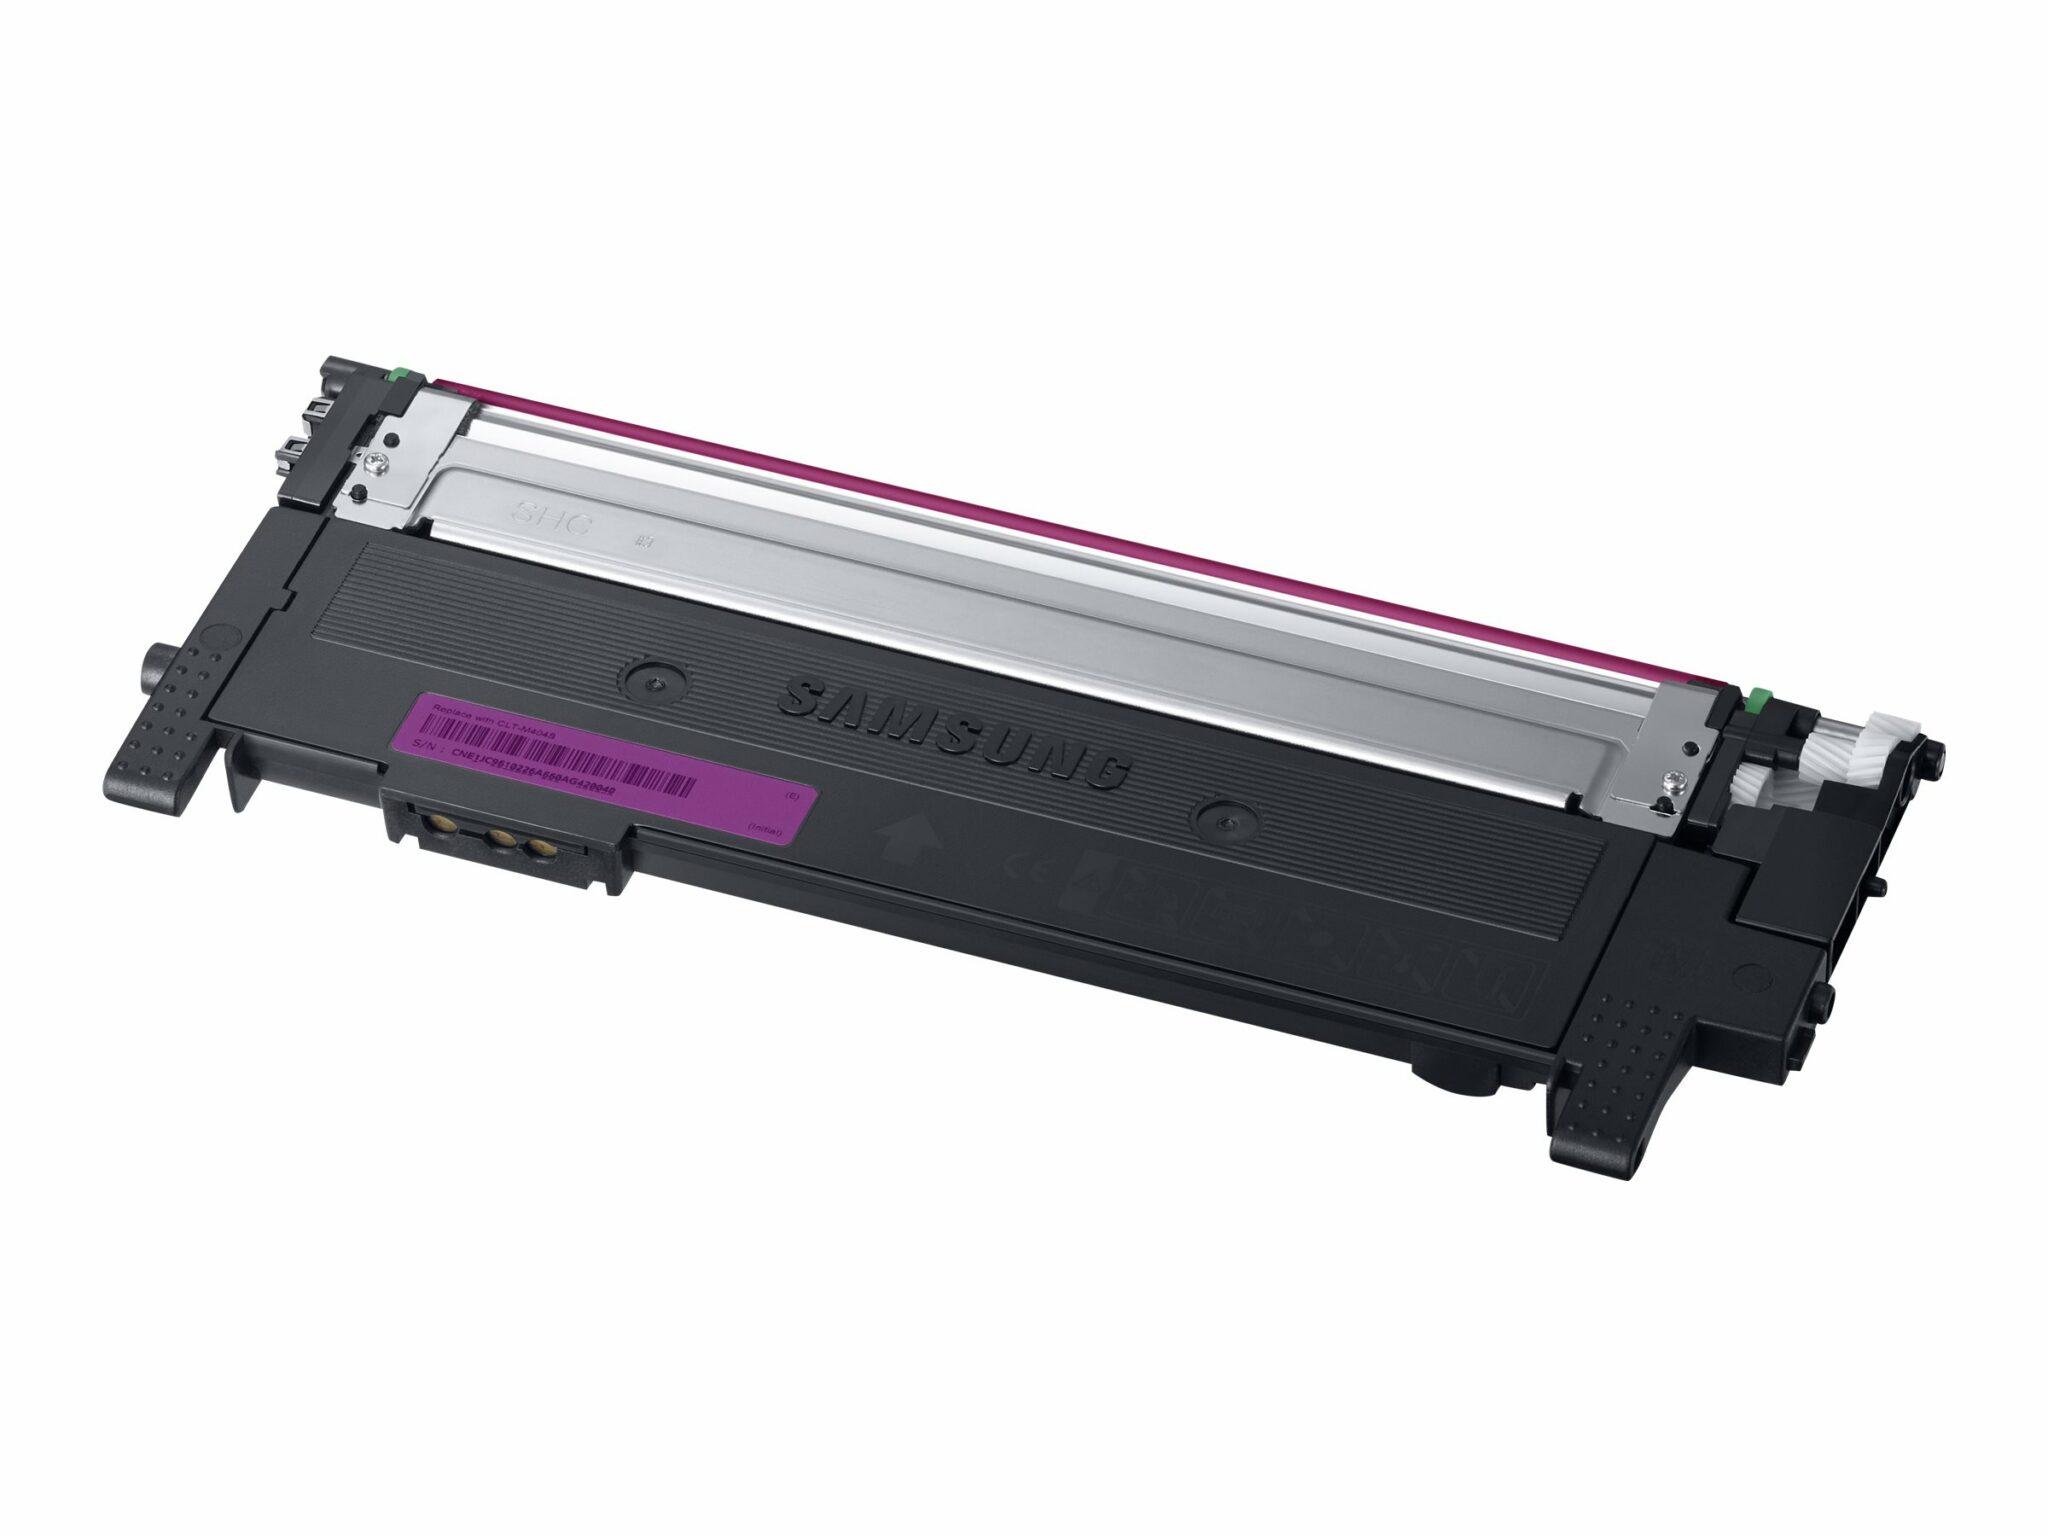 HPI Samsung CLT-M404S Magenta Toner Cartridge